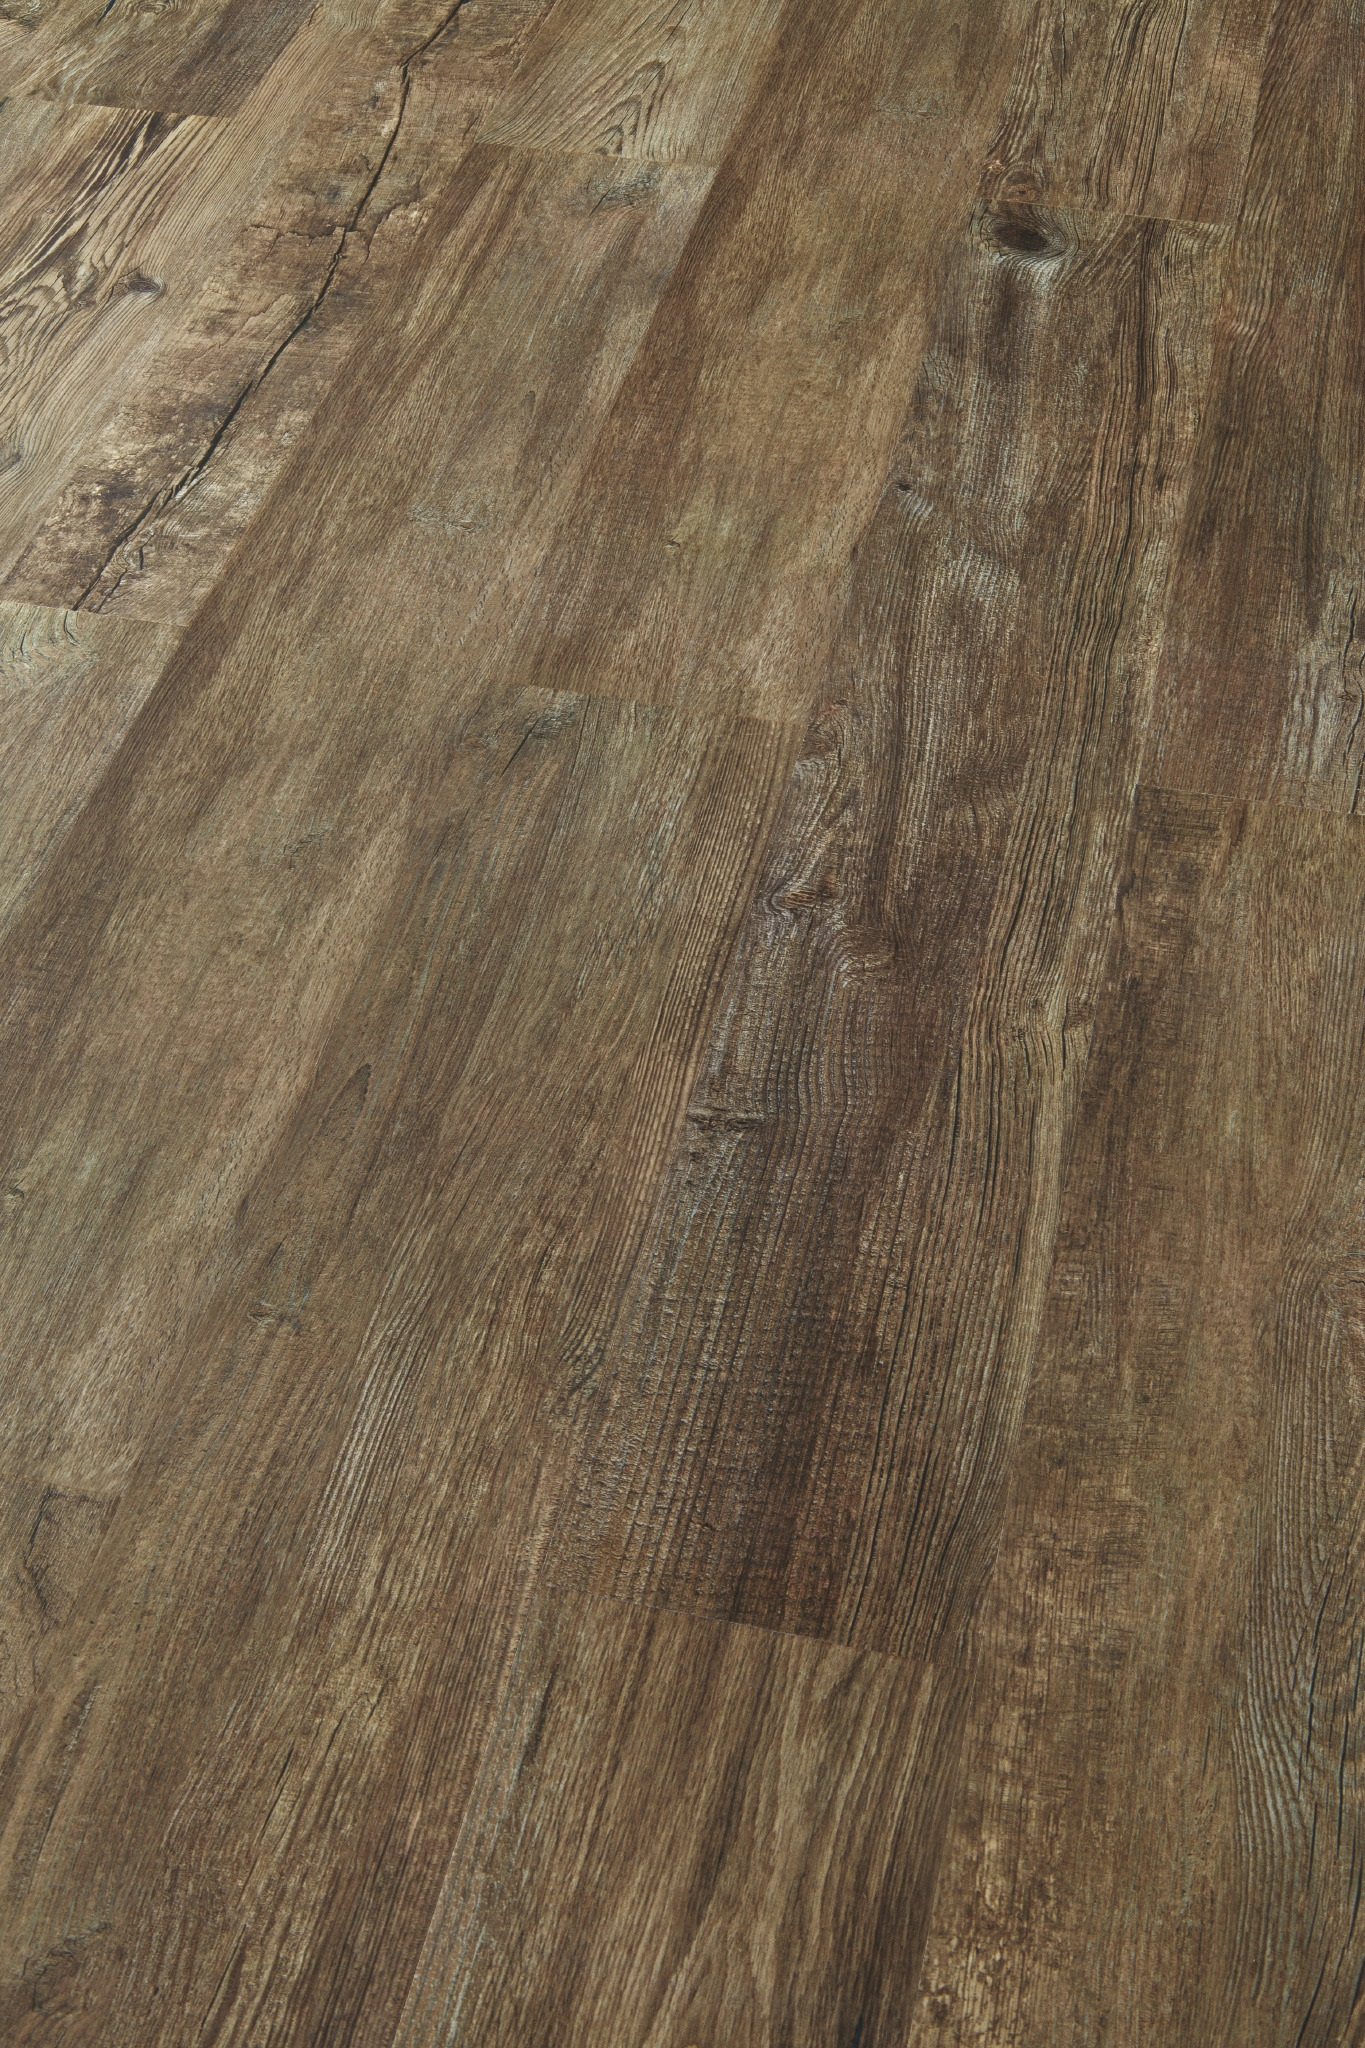 Smocky barn wood